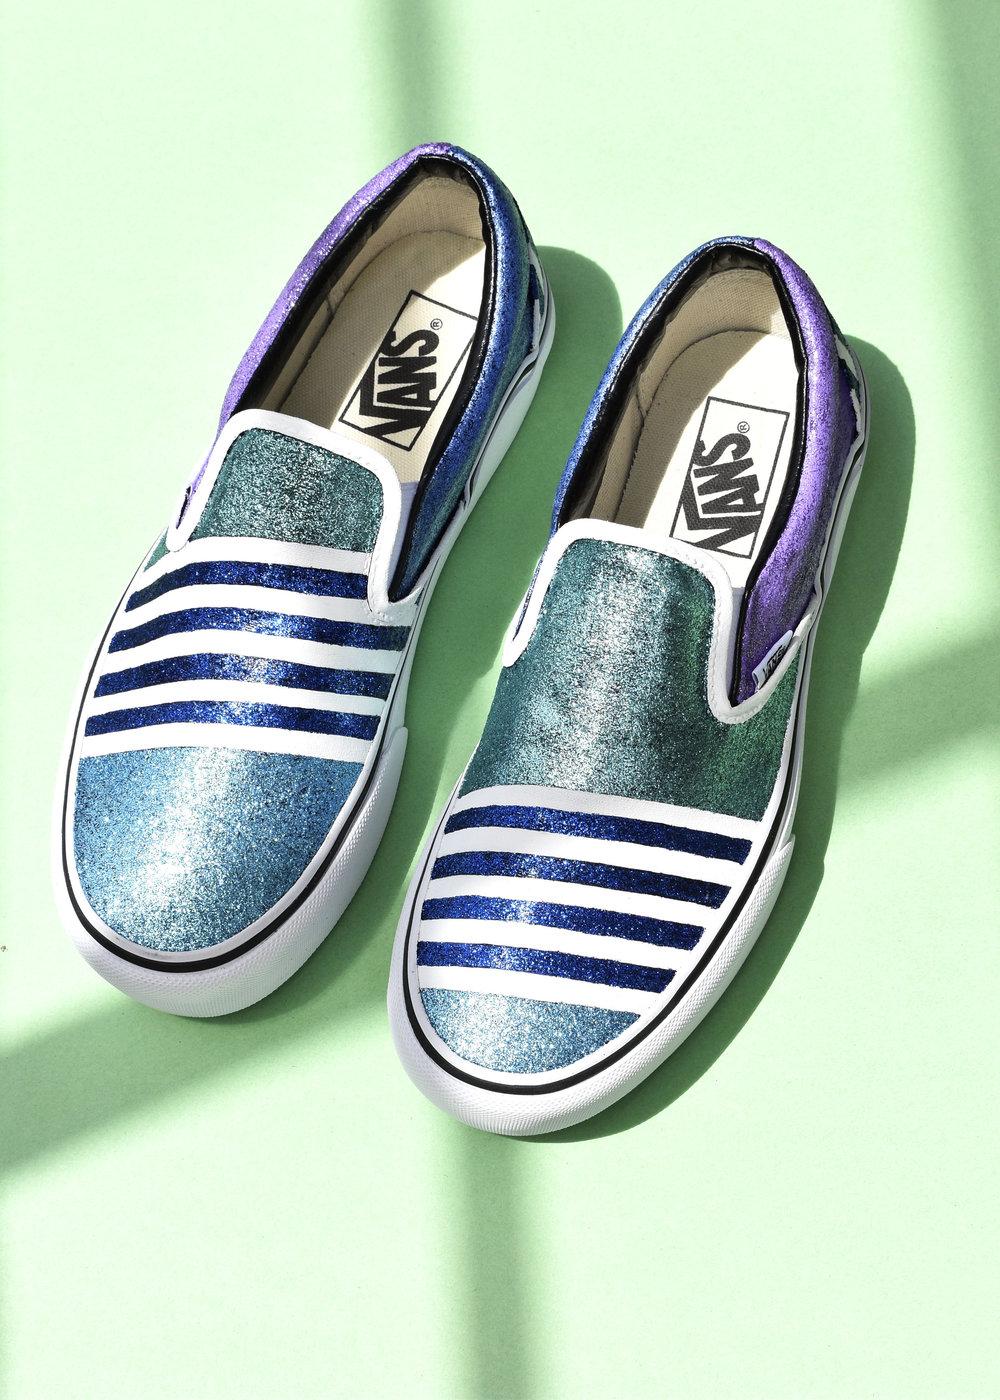 Who-leesa_kicks_Juli_stripes_glitter_2a.jpg